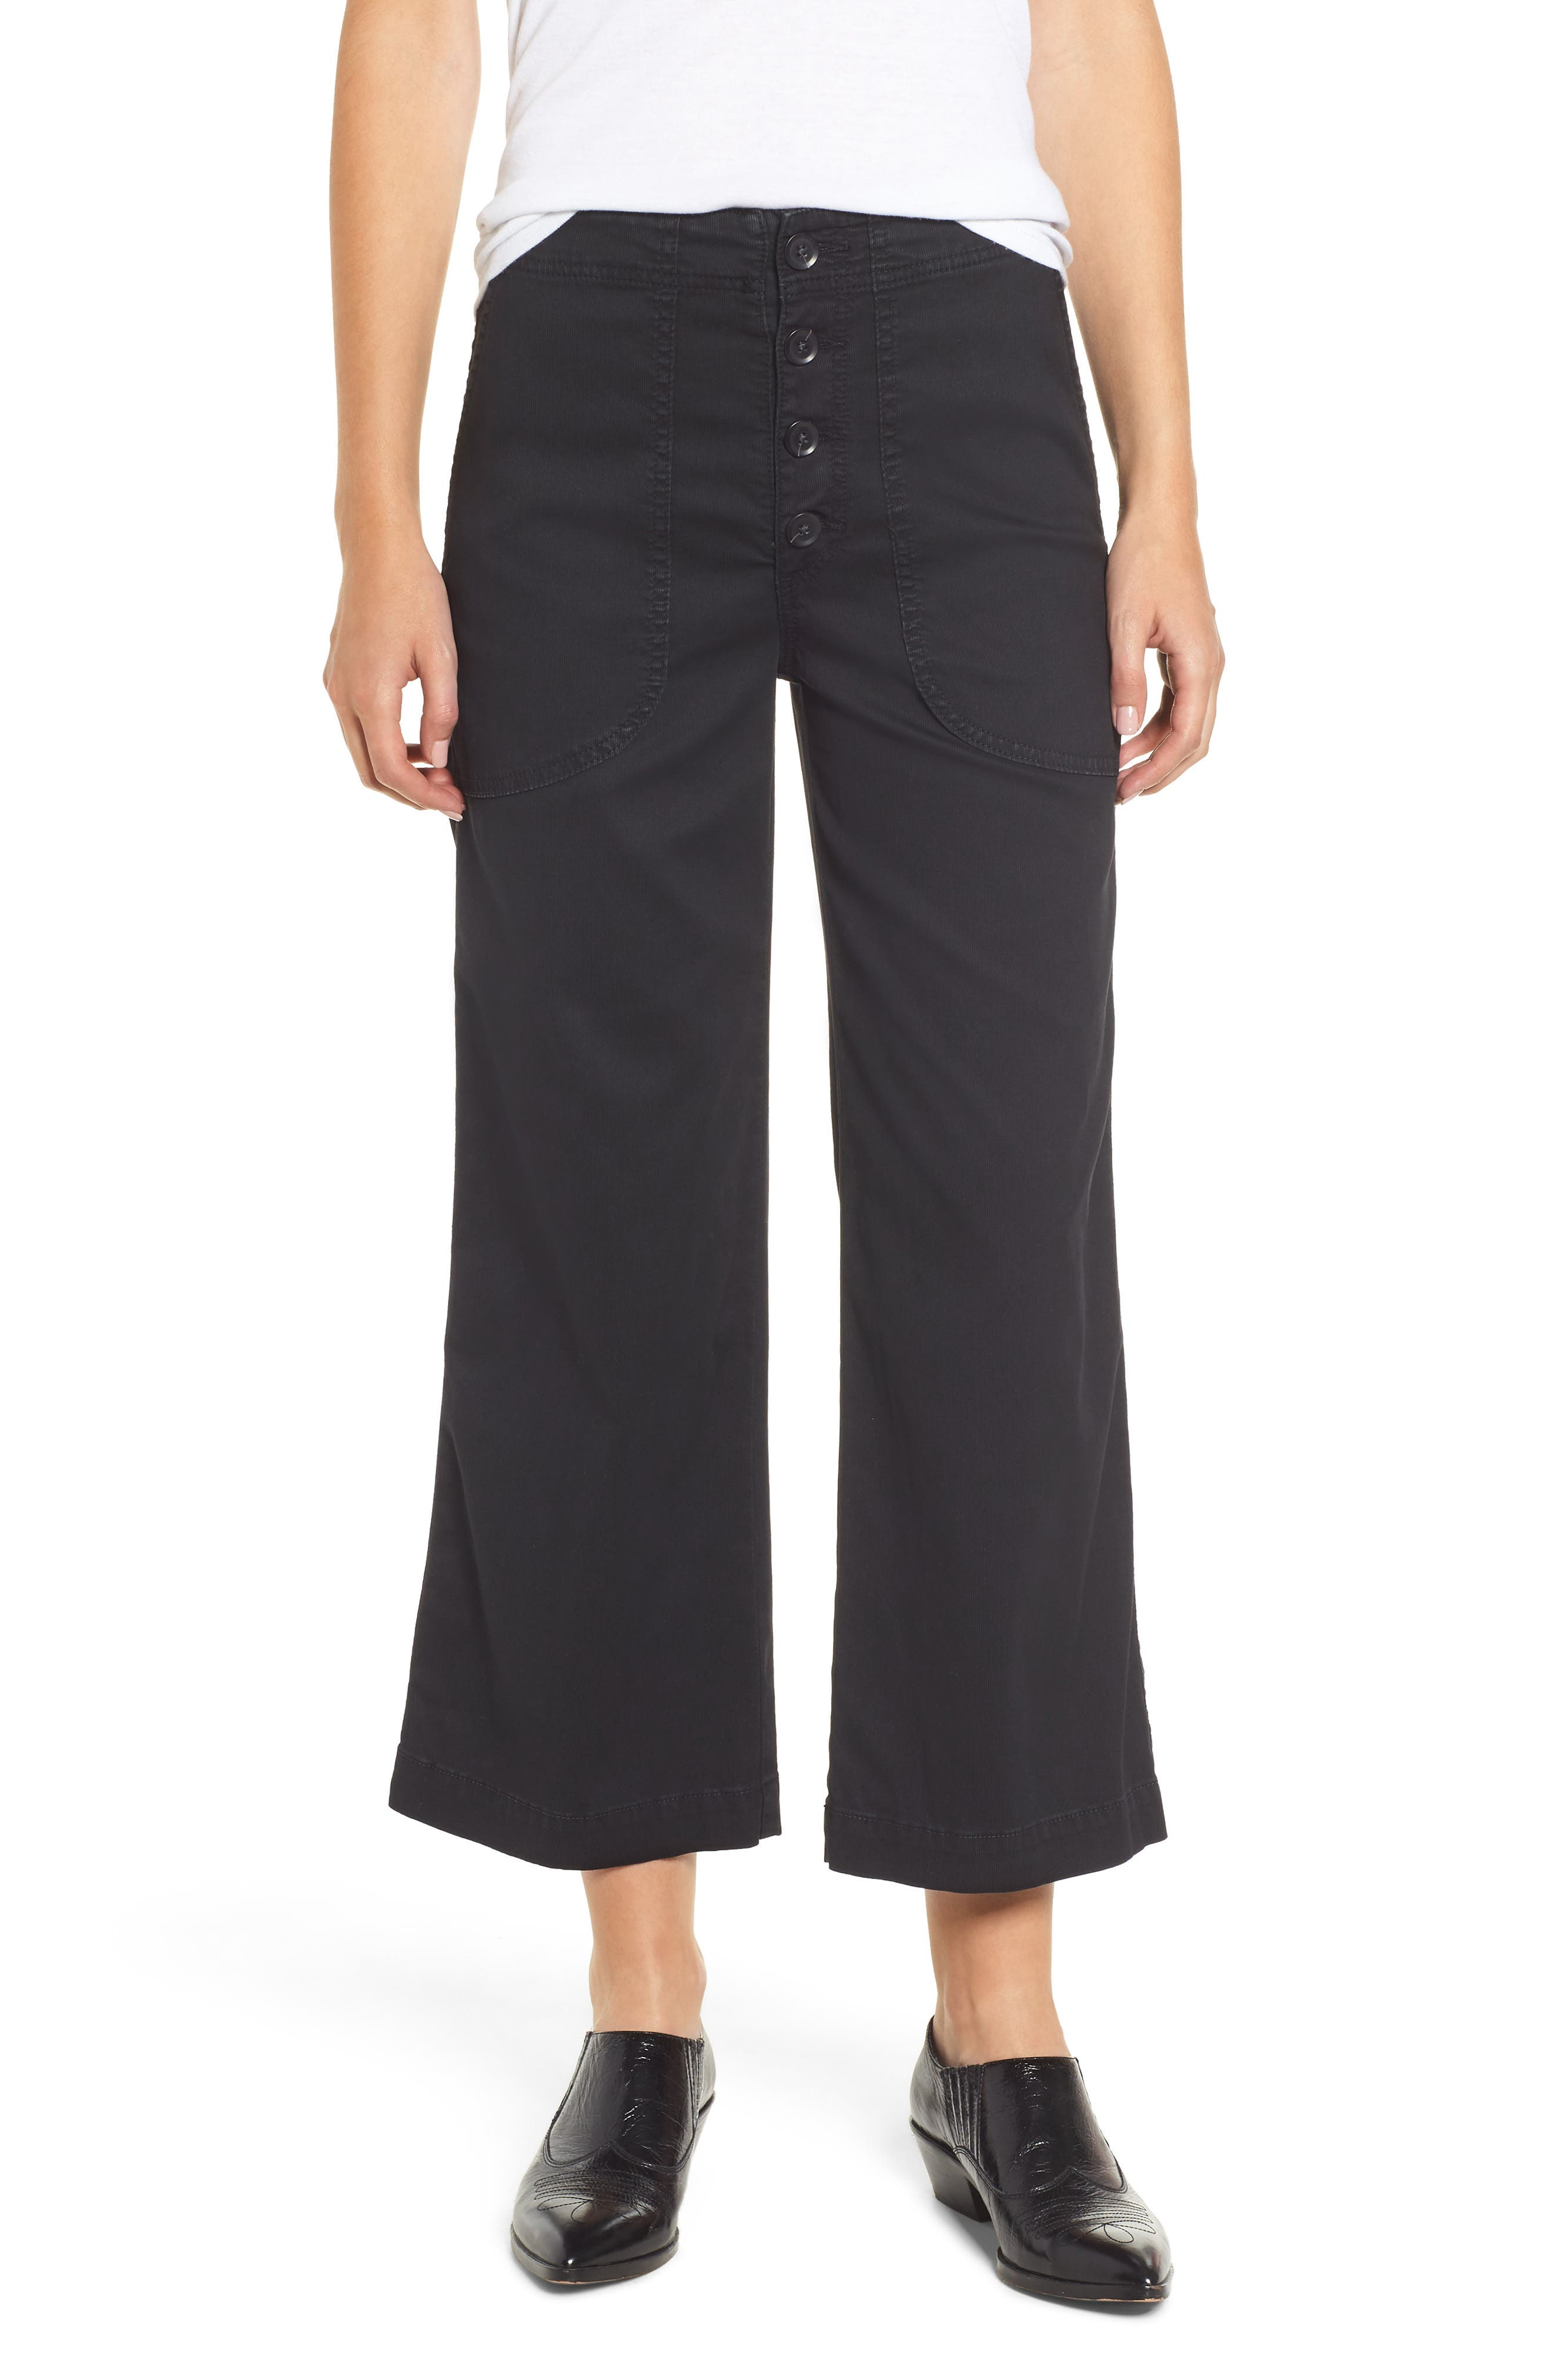 Etta High Waist Crop Wide Leg Jeans,                             Main thumbnail 1, color,                             SULFUR SUPER BLACK